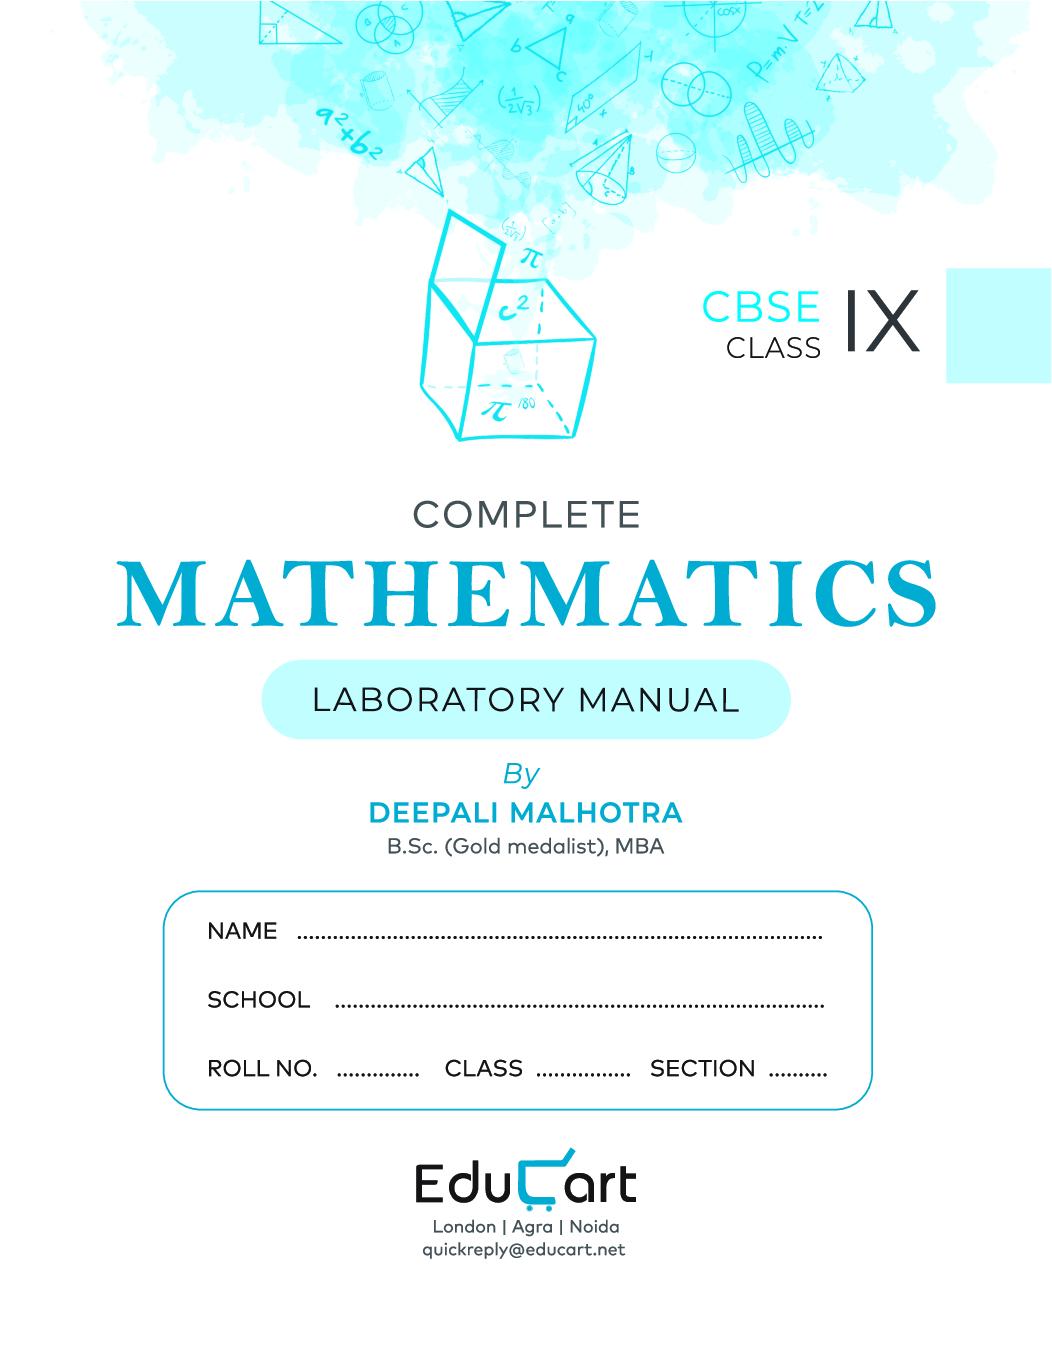 Educart CBSE Complete Mathematics Laboratory Manual For Class - IX - Page 3